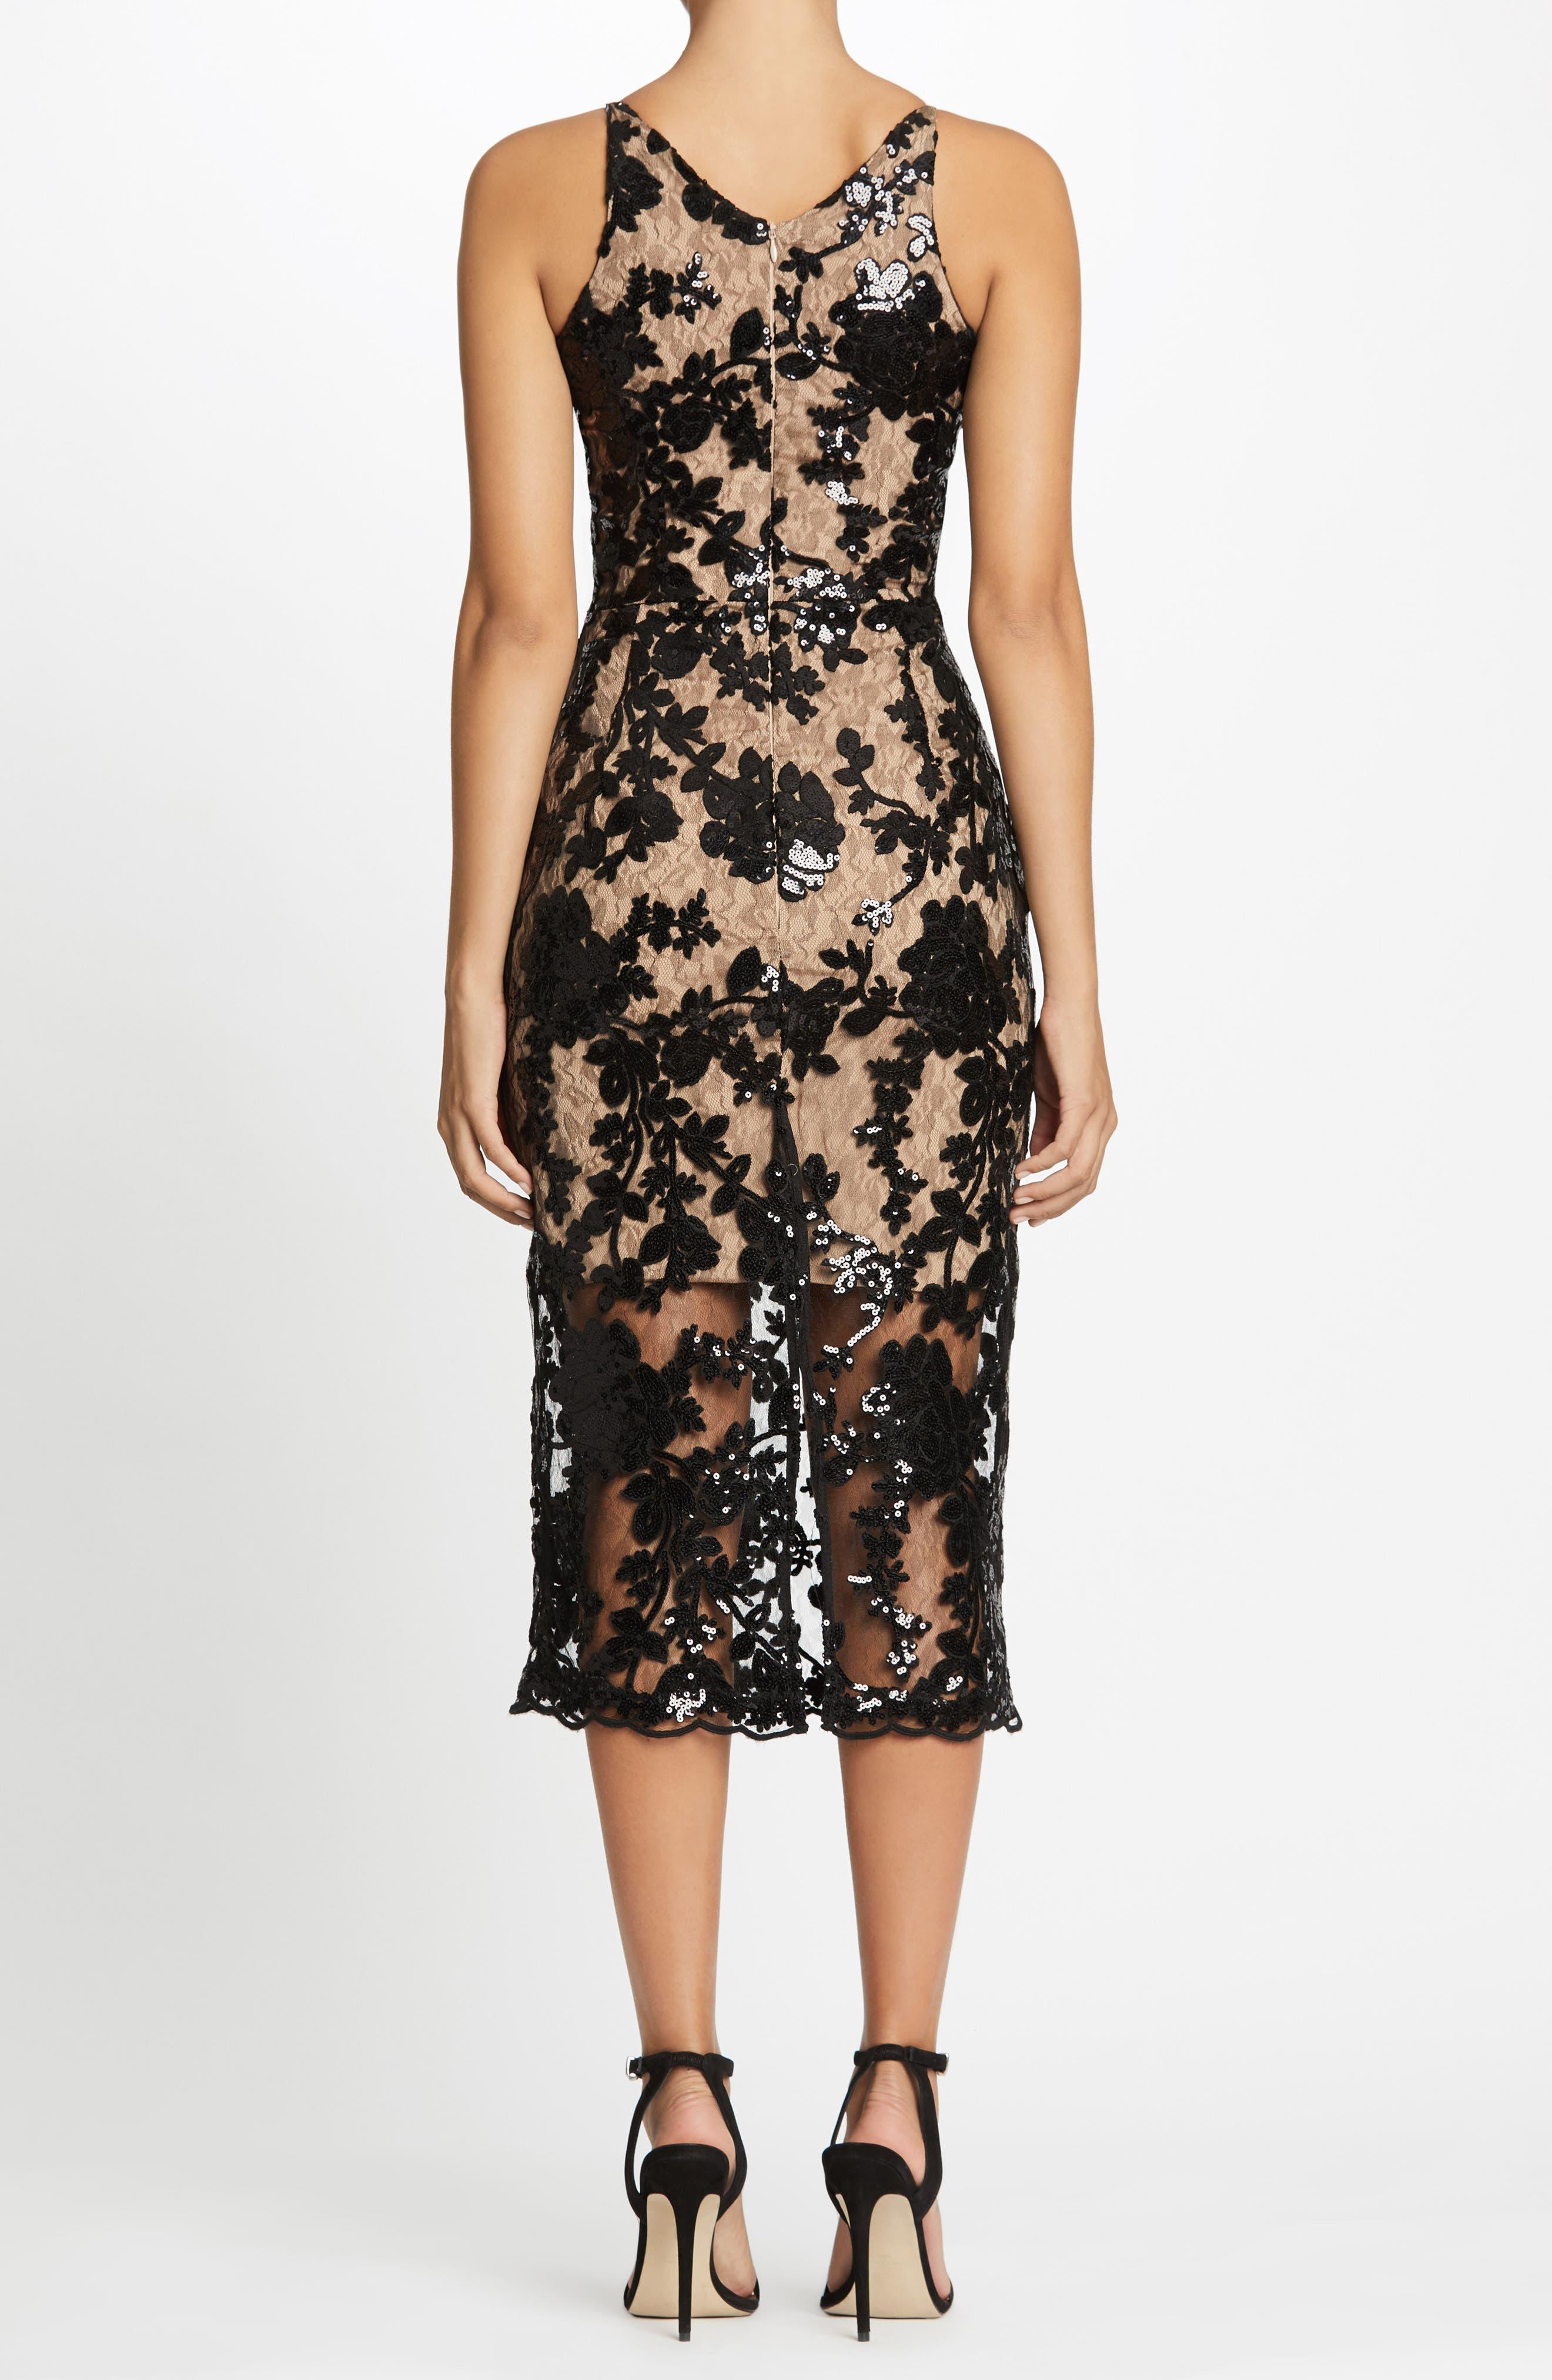 Rebecca Floral Lace Midi Dress,                             Alternate thumbnail 2, color,                             002